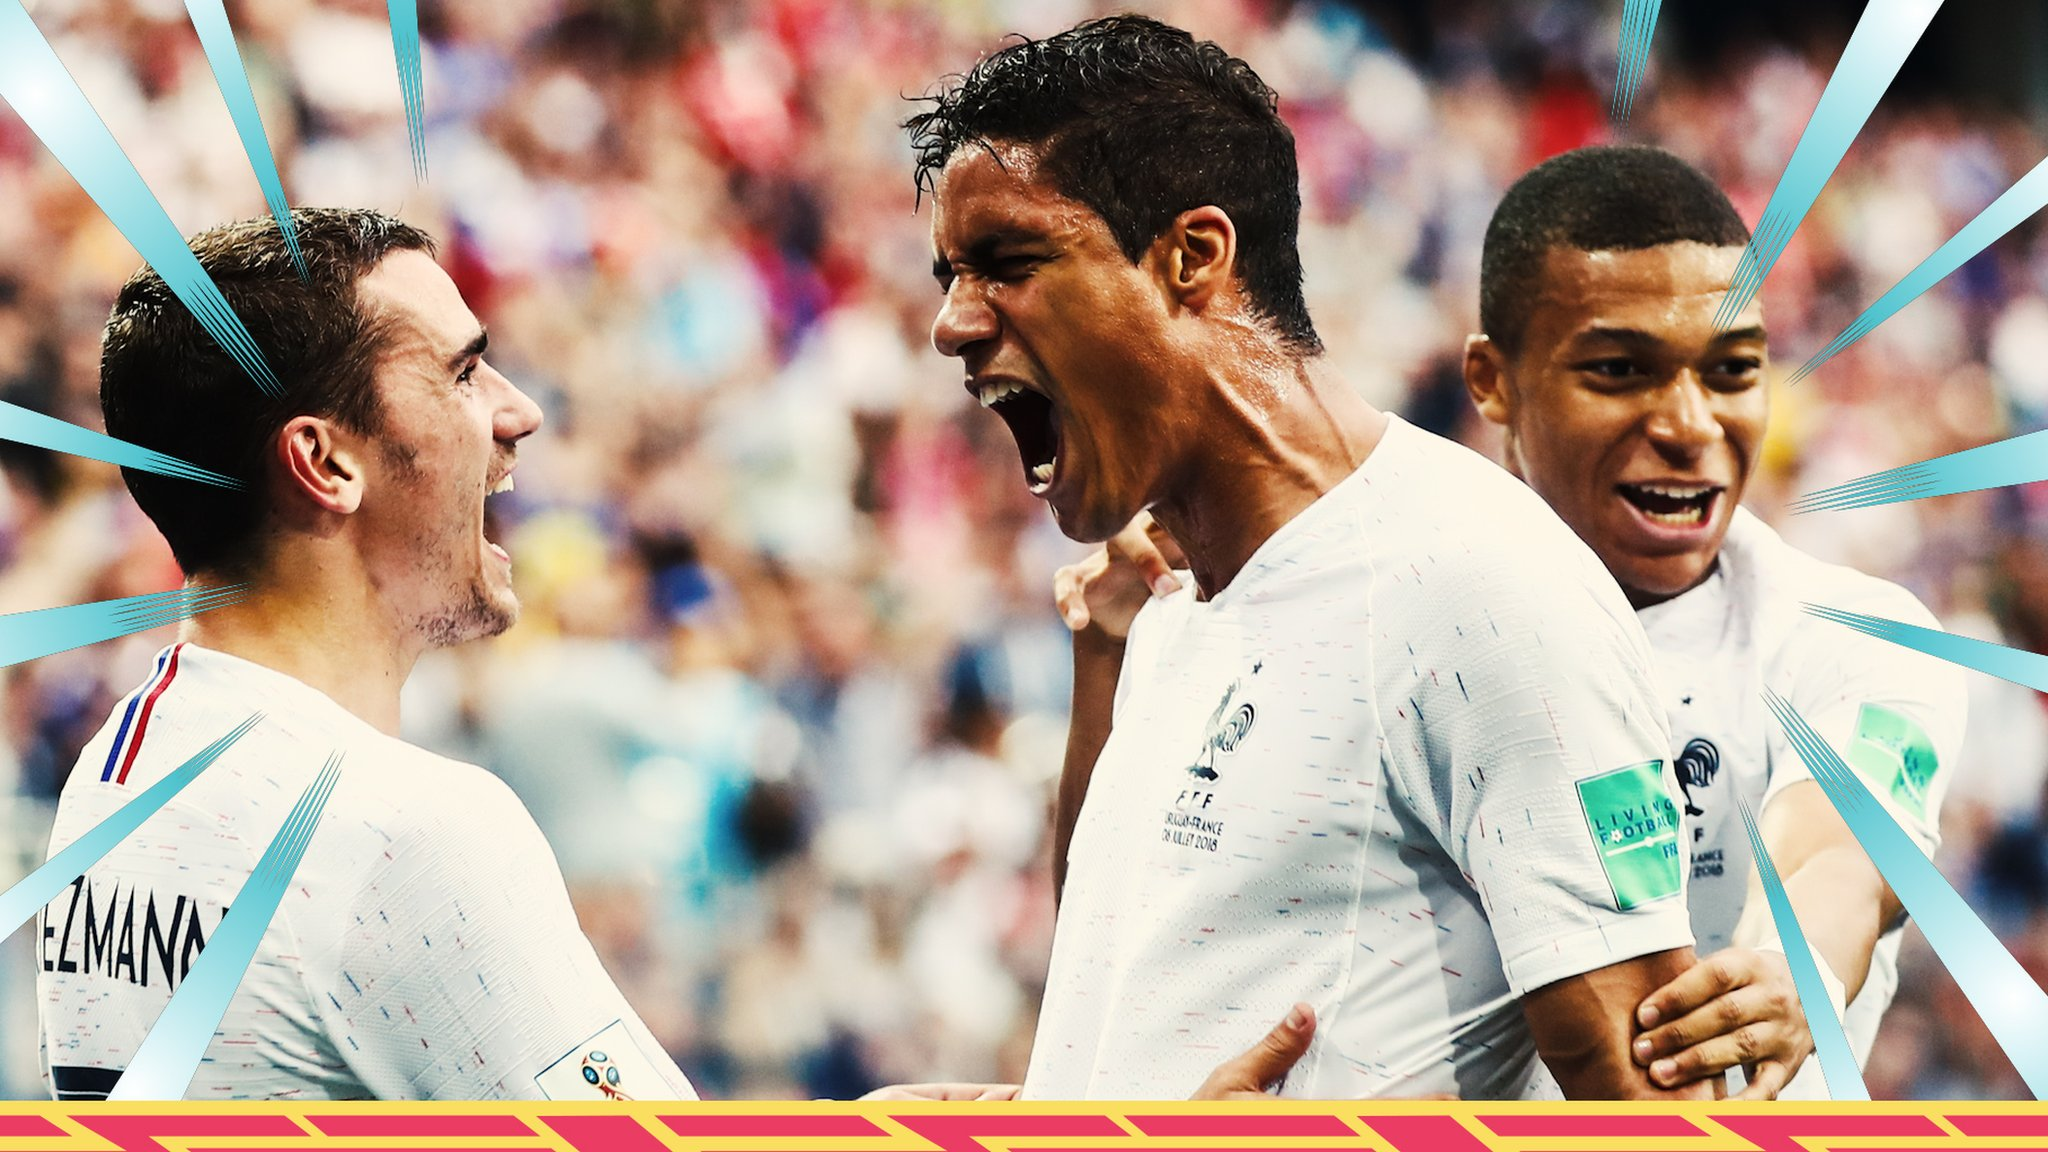 World Cup 2018: Uruguay 0-2 France highlights